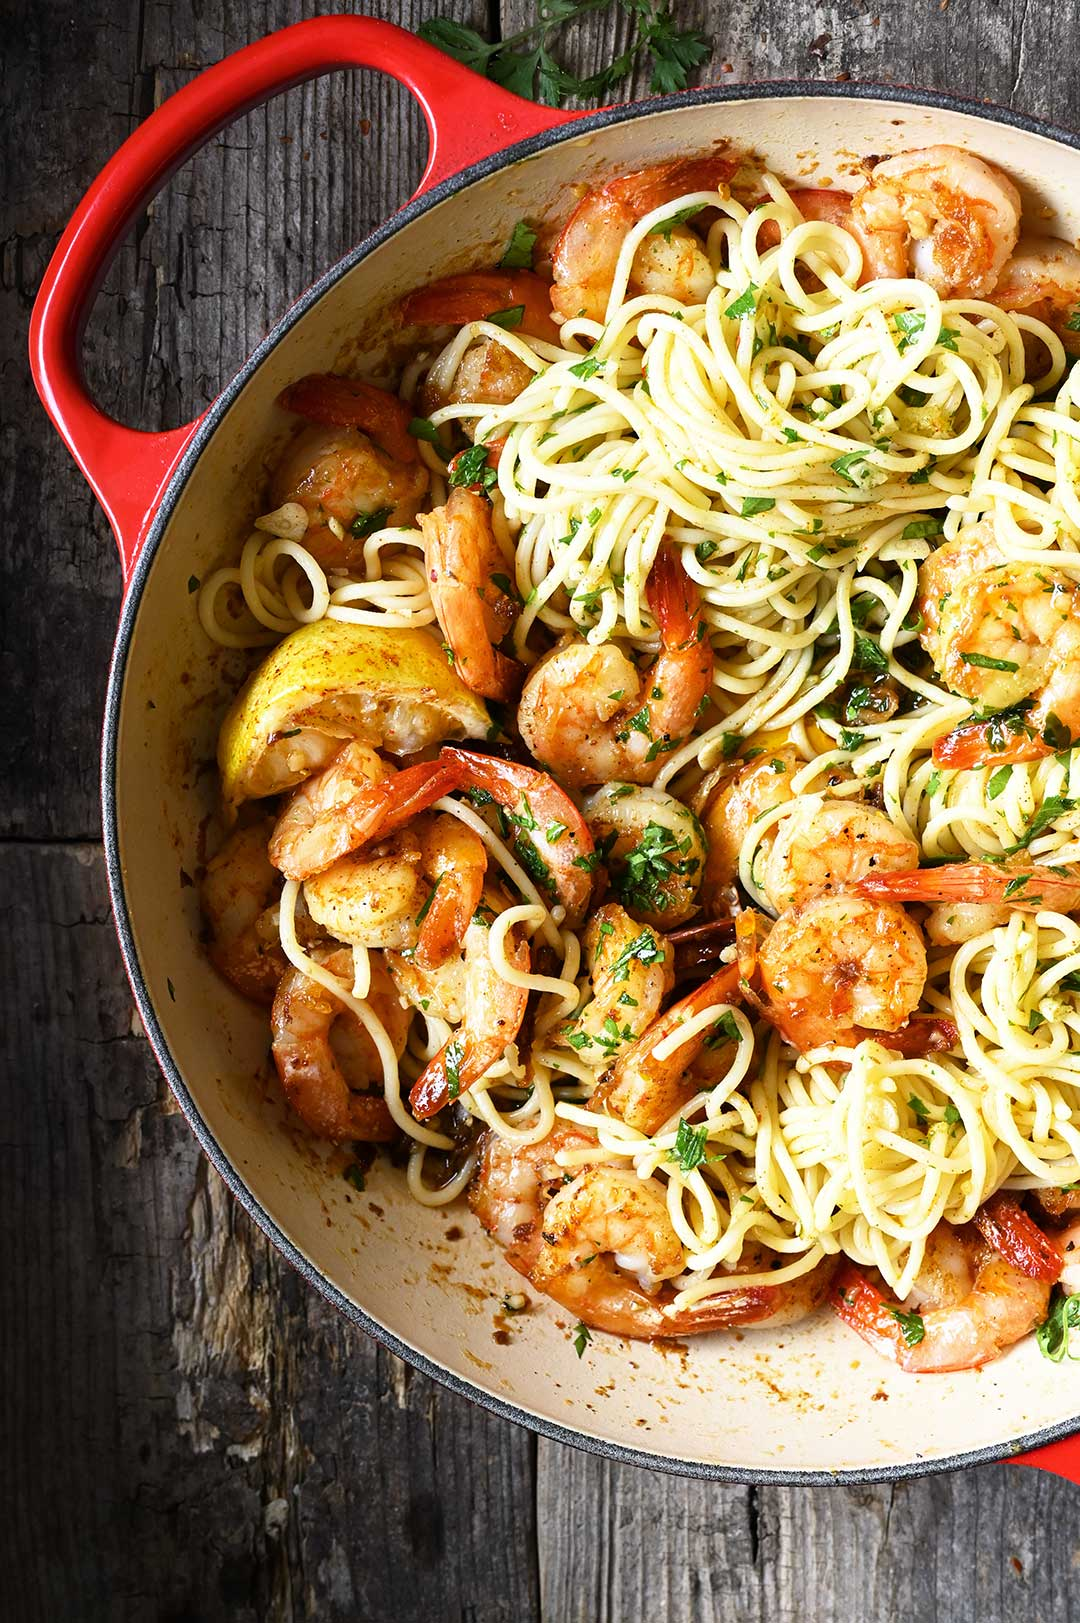 serving dumplings | Garlic butter pasta with shrimp